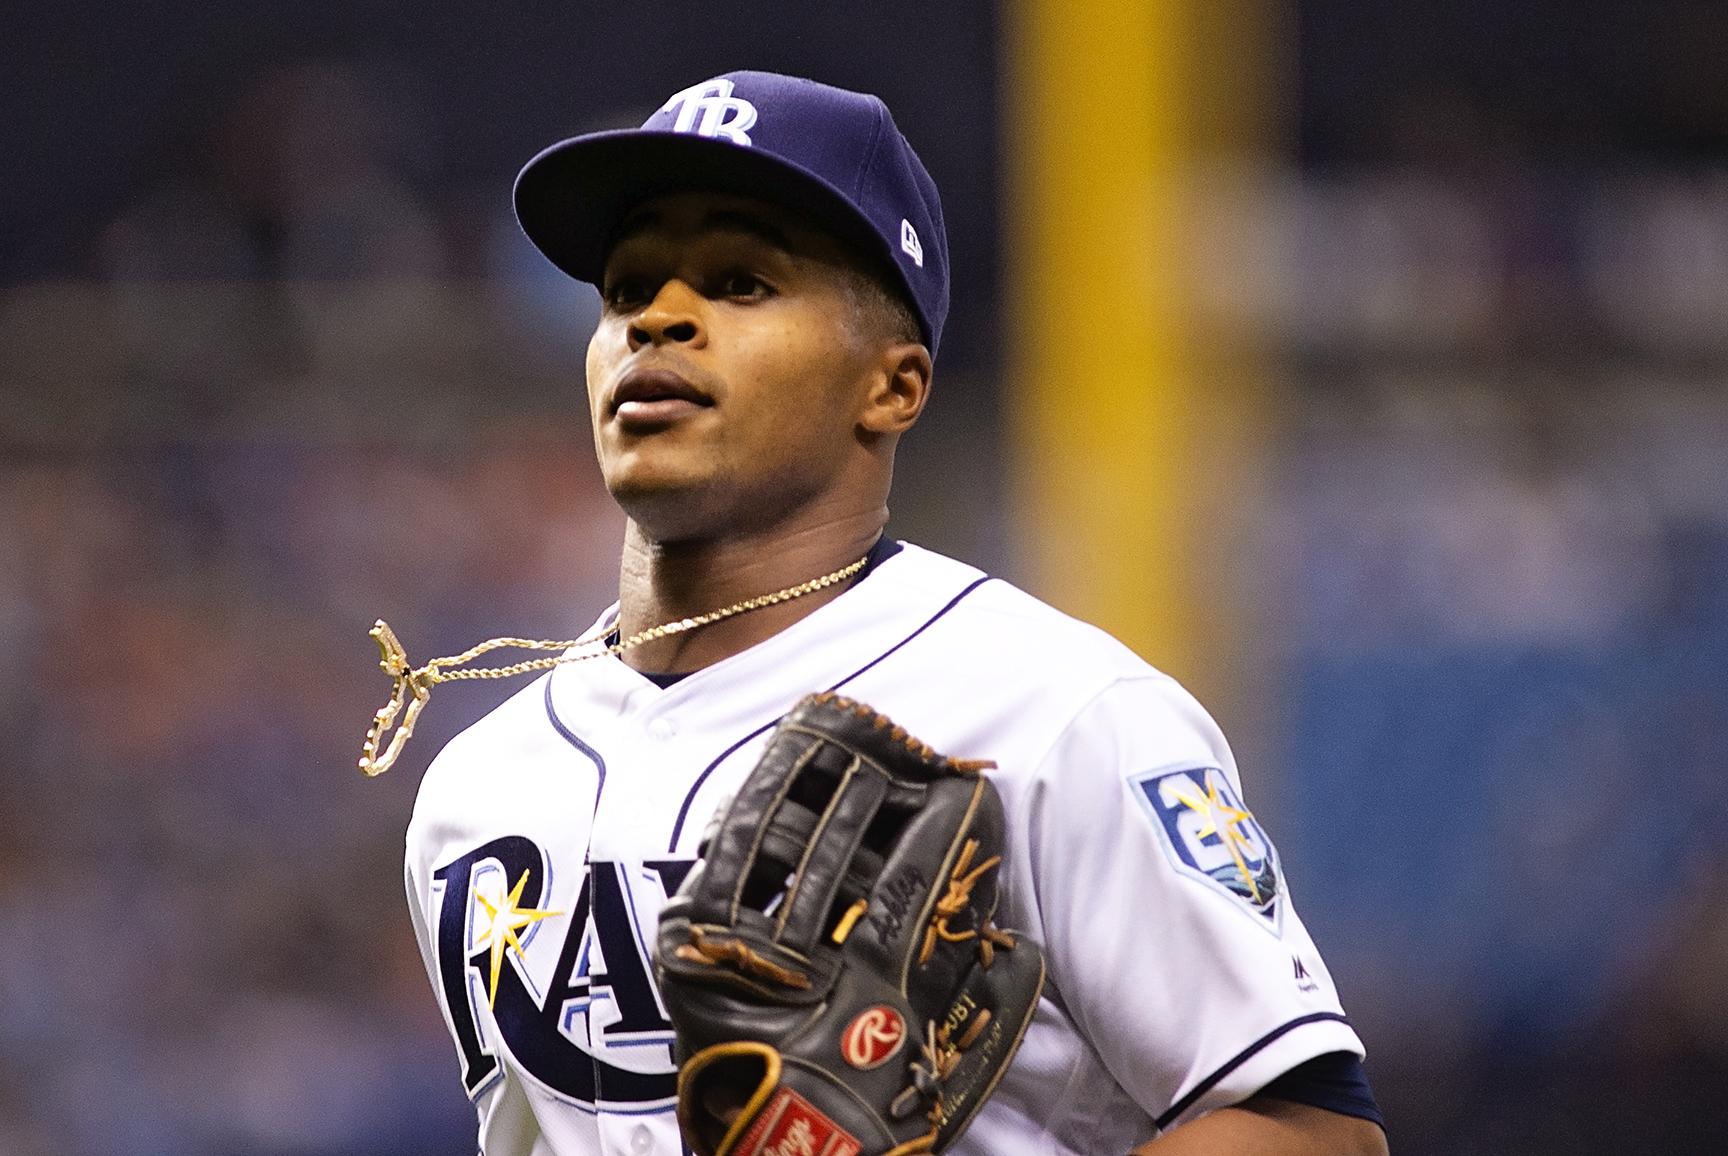 Mallex Smith had three hits in the Rays' victory./CARMEN MANDATO